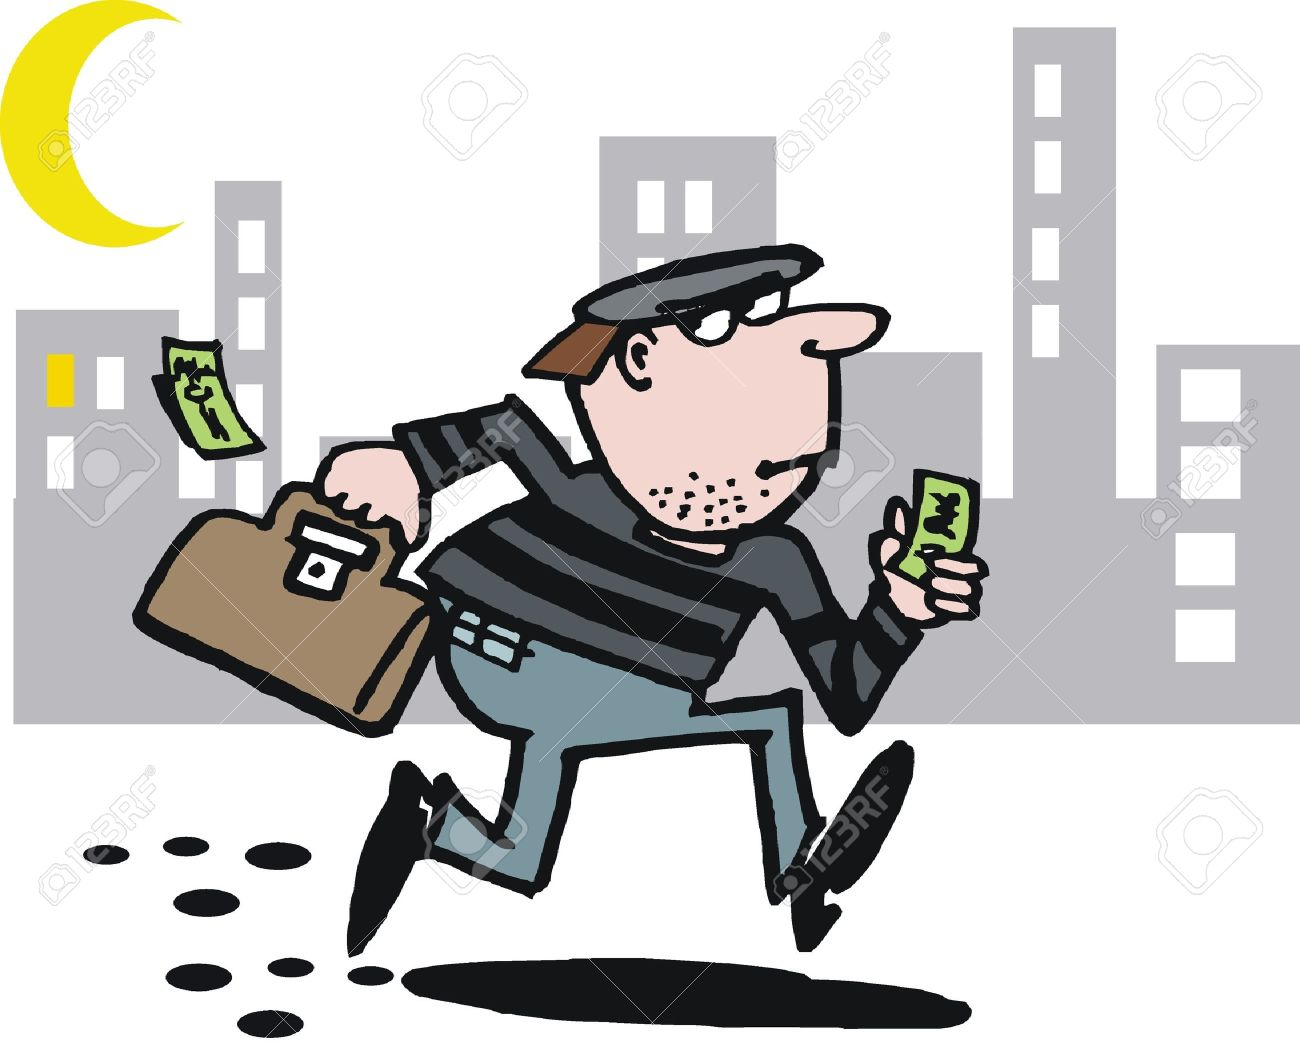 Cartoon Thief Running Cartoon Thief Running